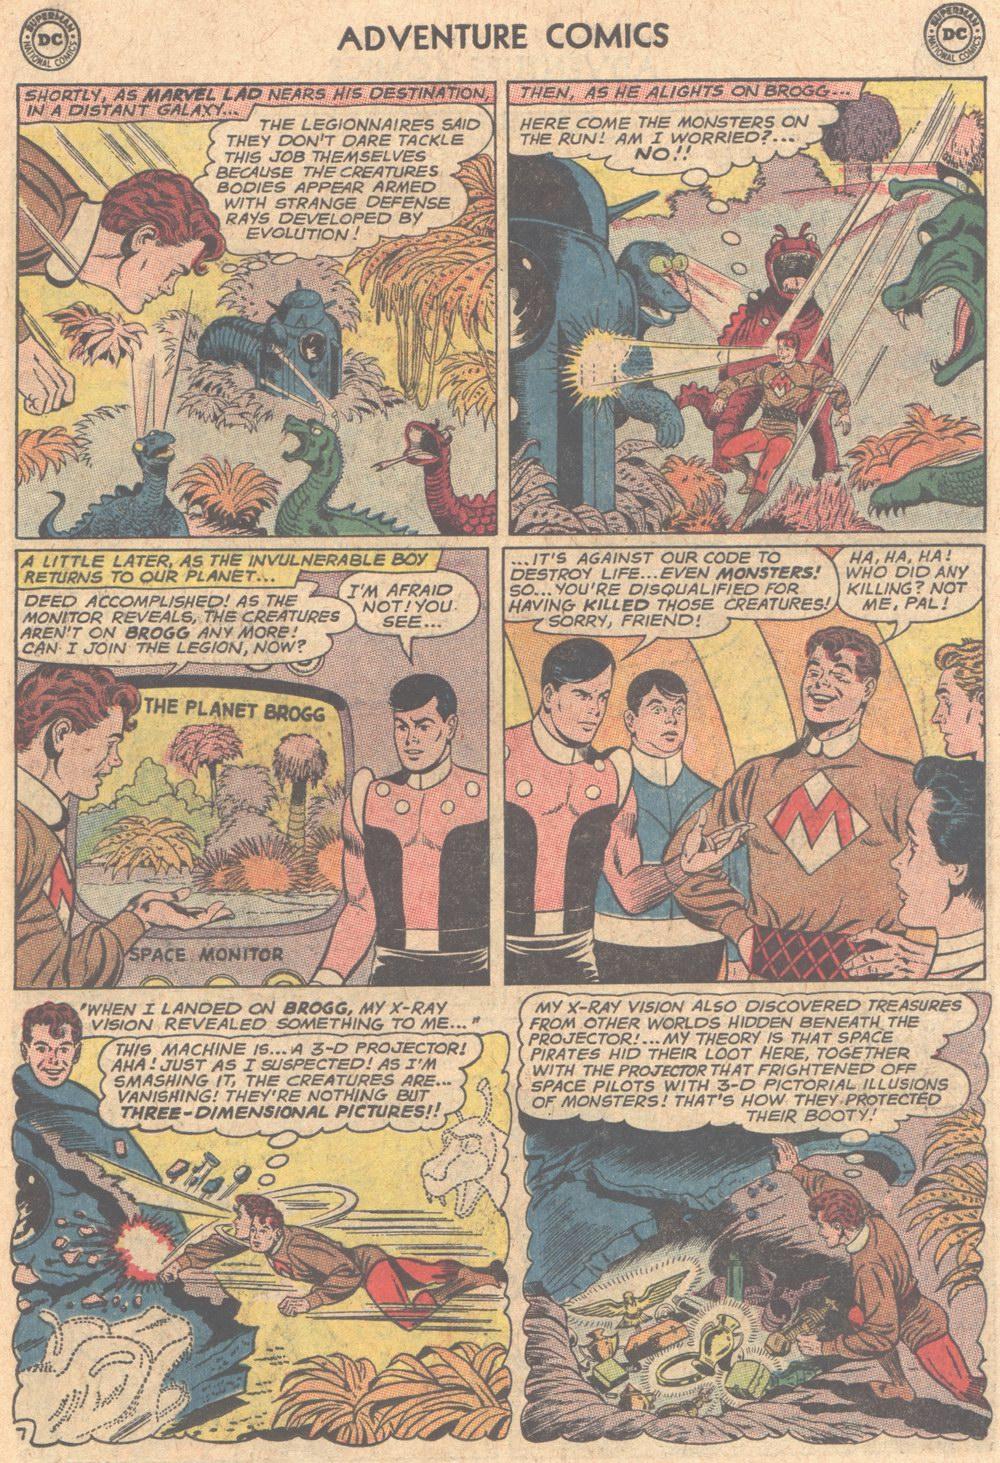 Read online Adventure Comics (1938) comic -  Issue #305 - 23